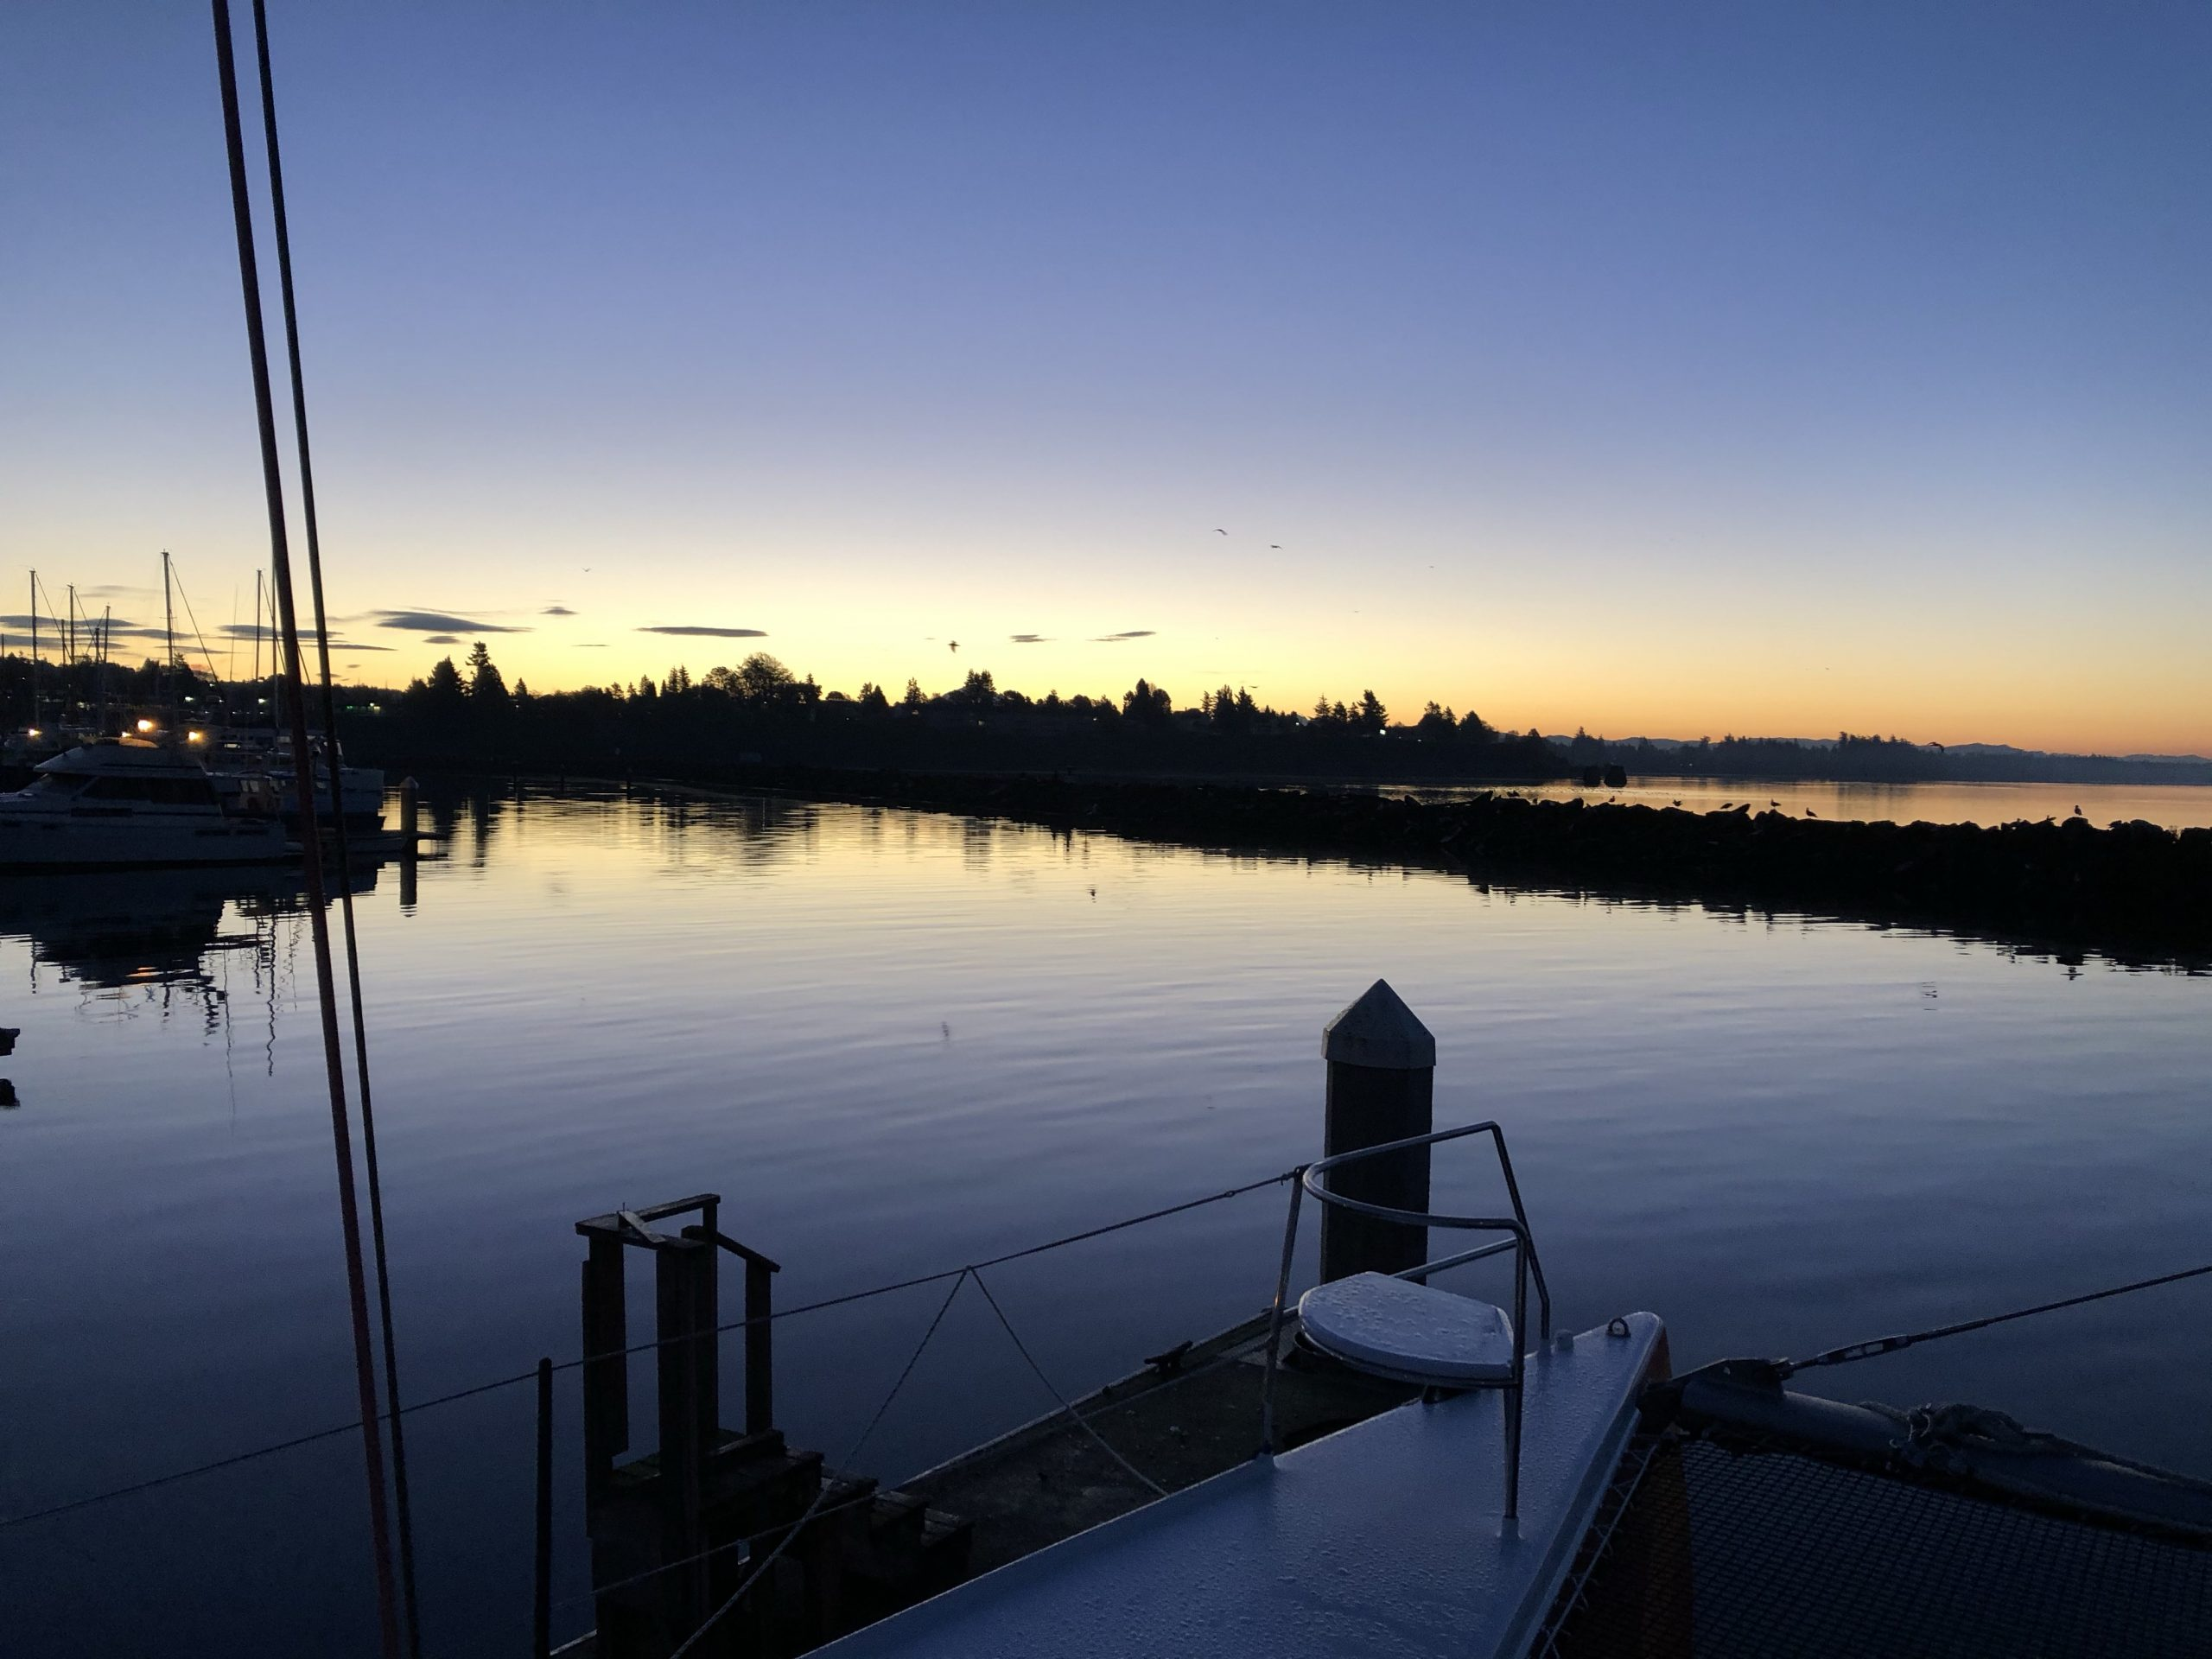 Pre-dawn in Blaine